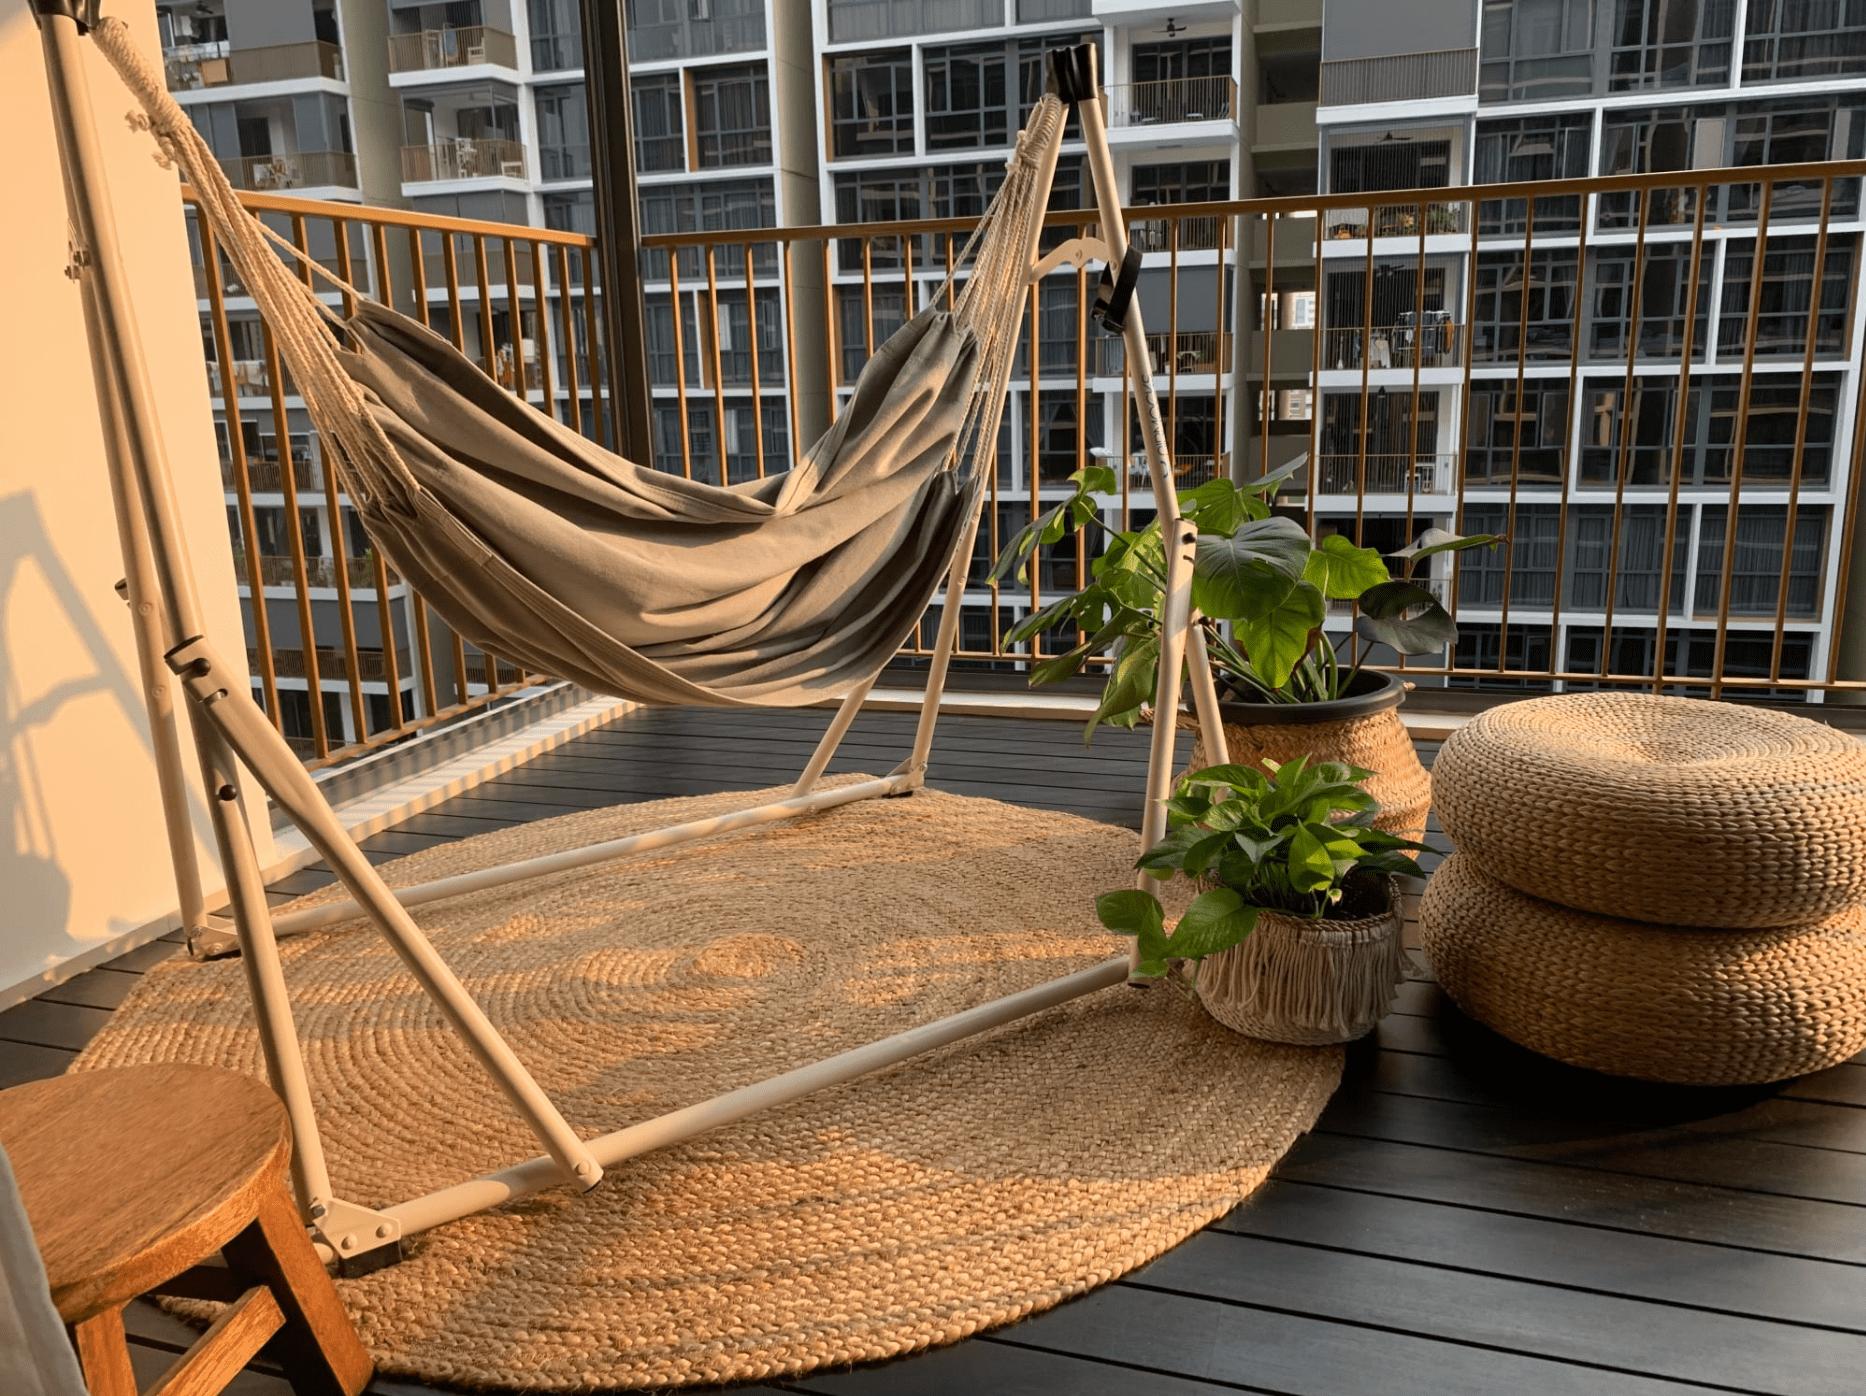 Castlery Marc Jute rug for home decor